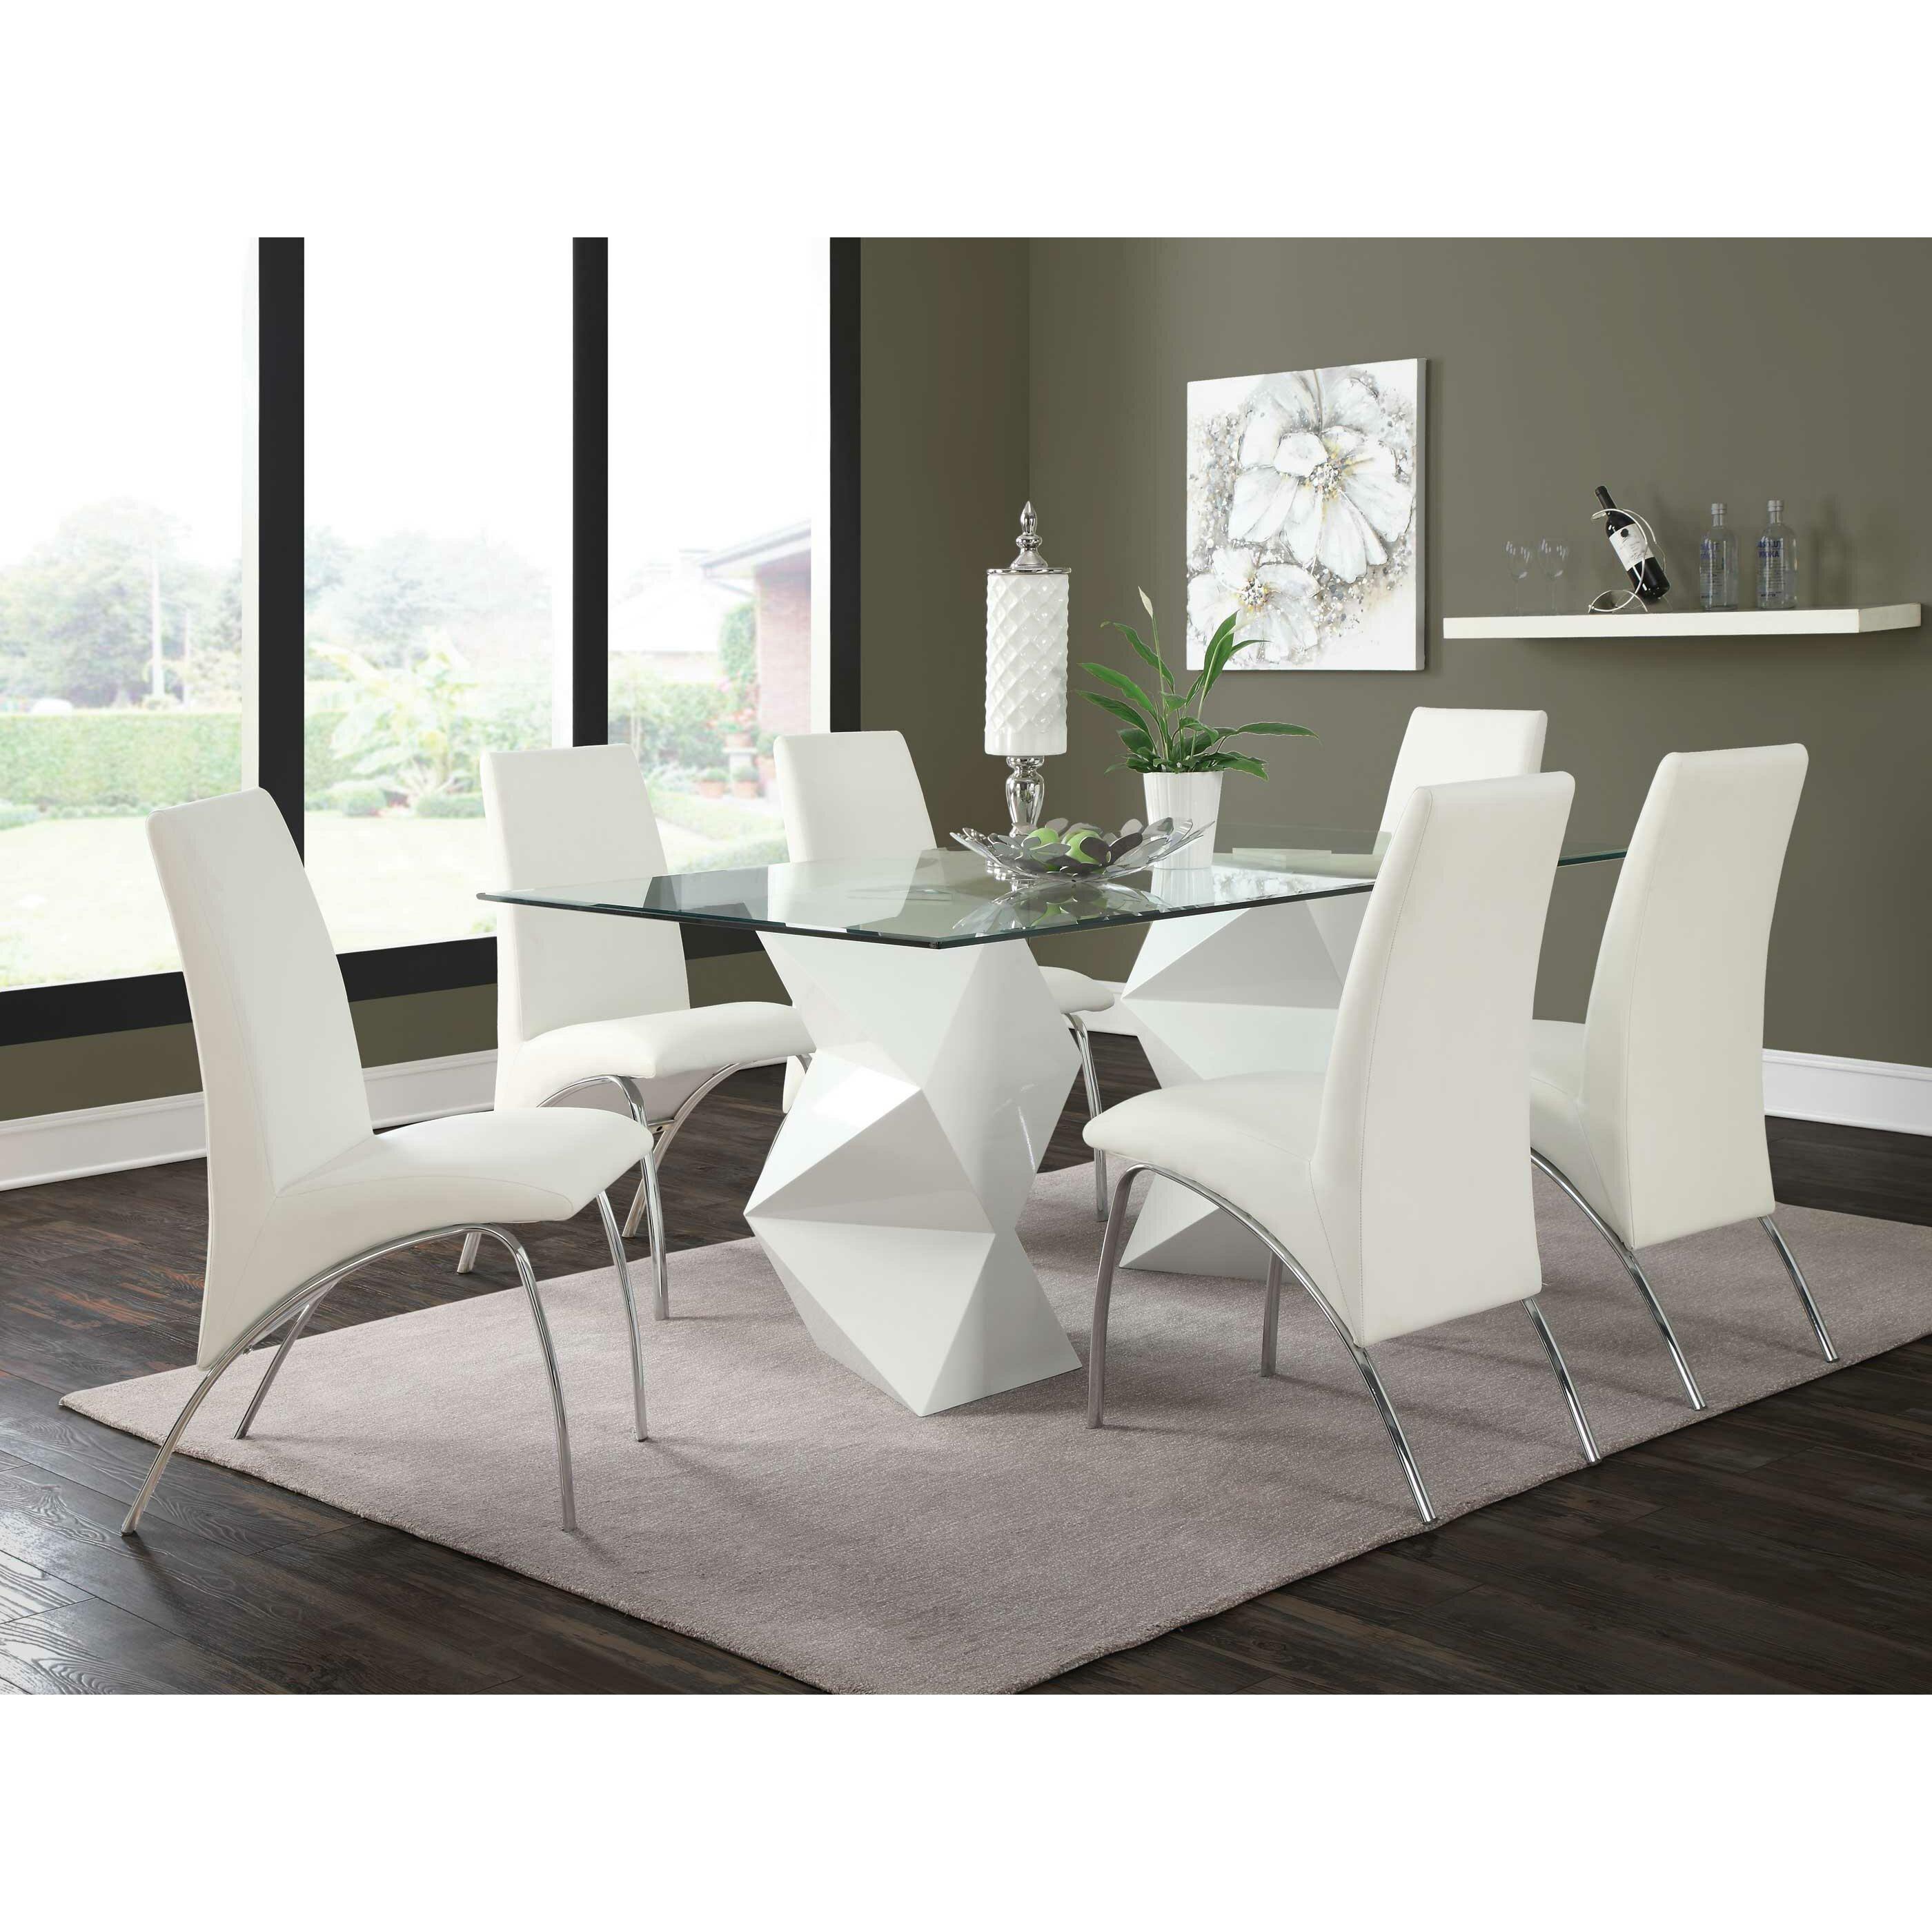 Wade logan delilah dining table reviews wayfair for Sofa esstisch